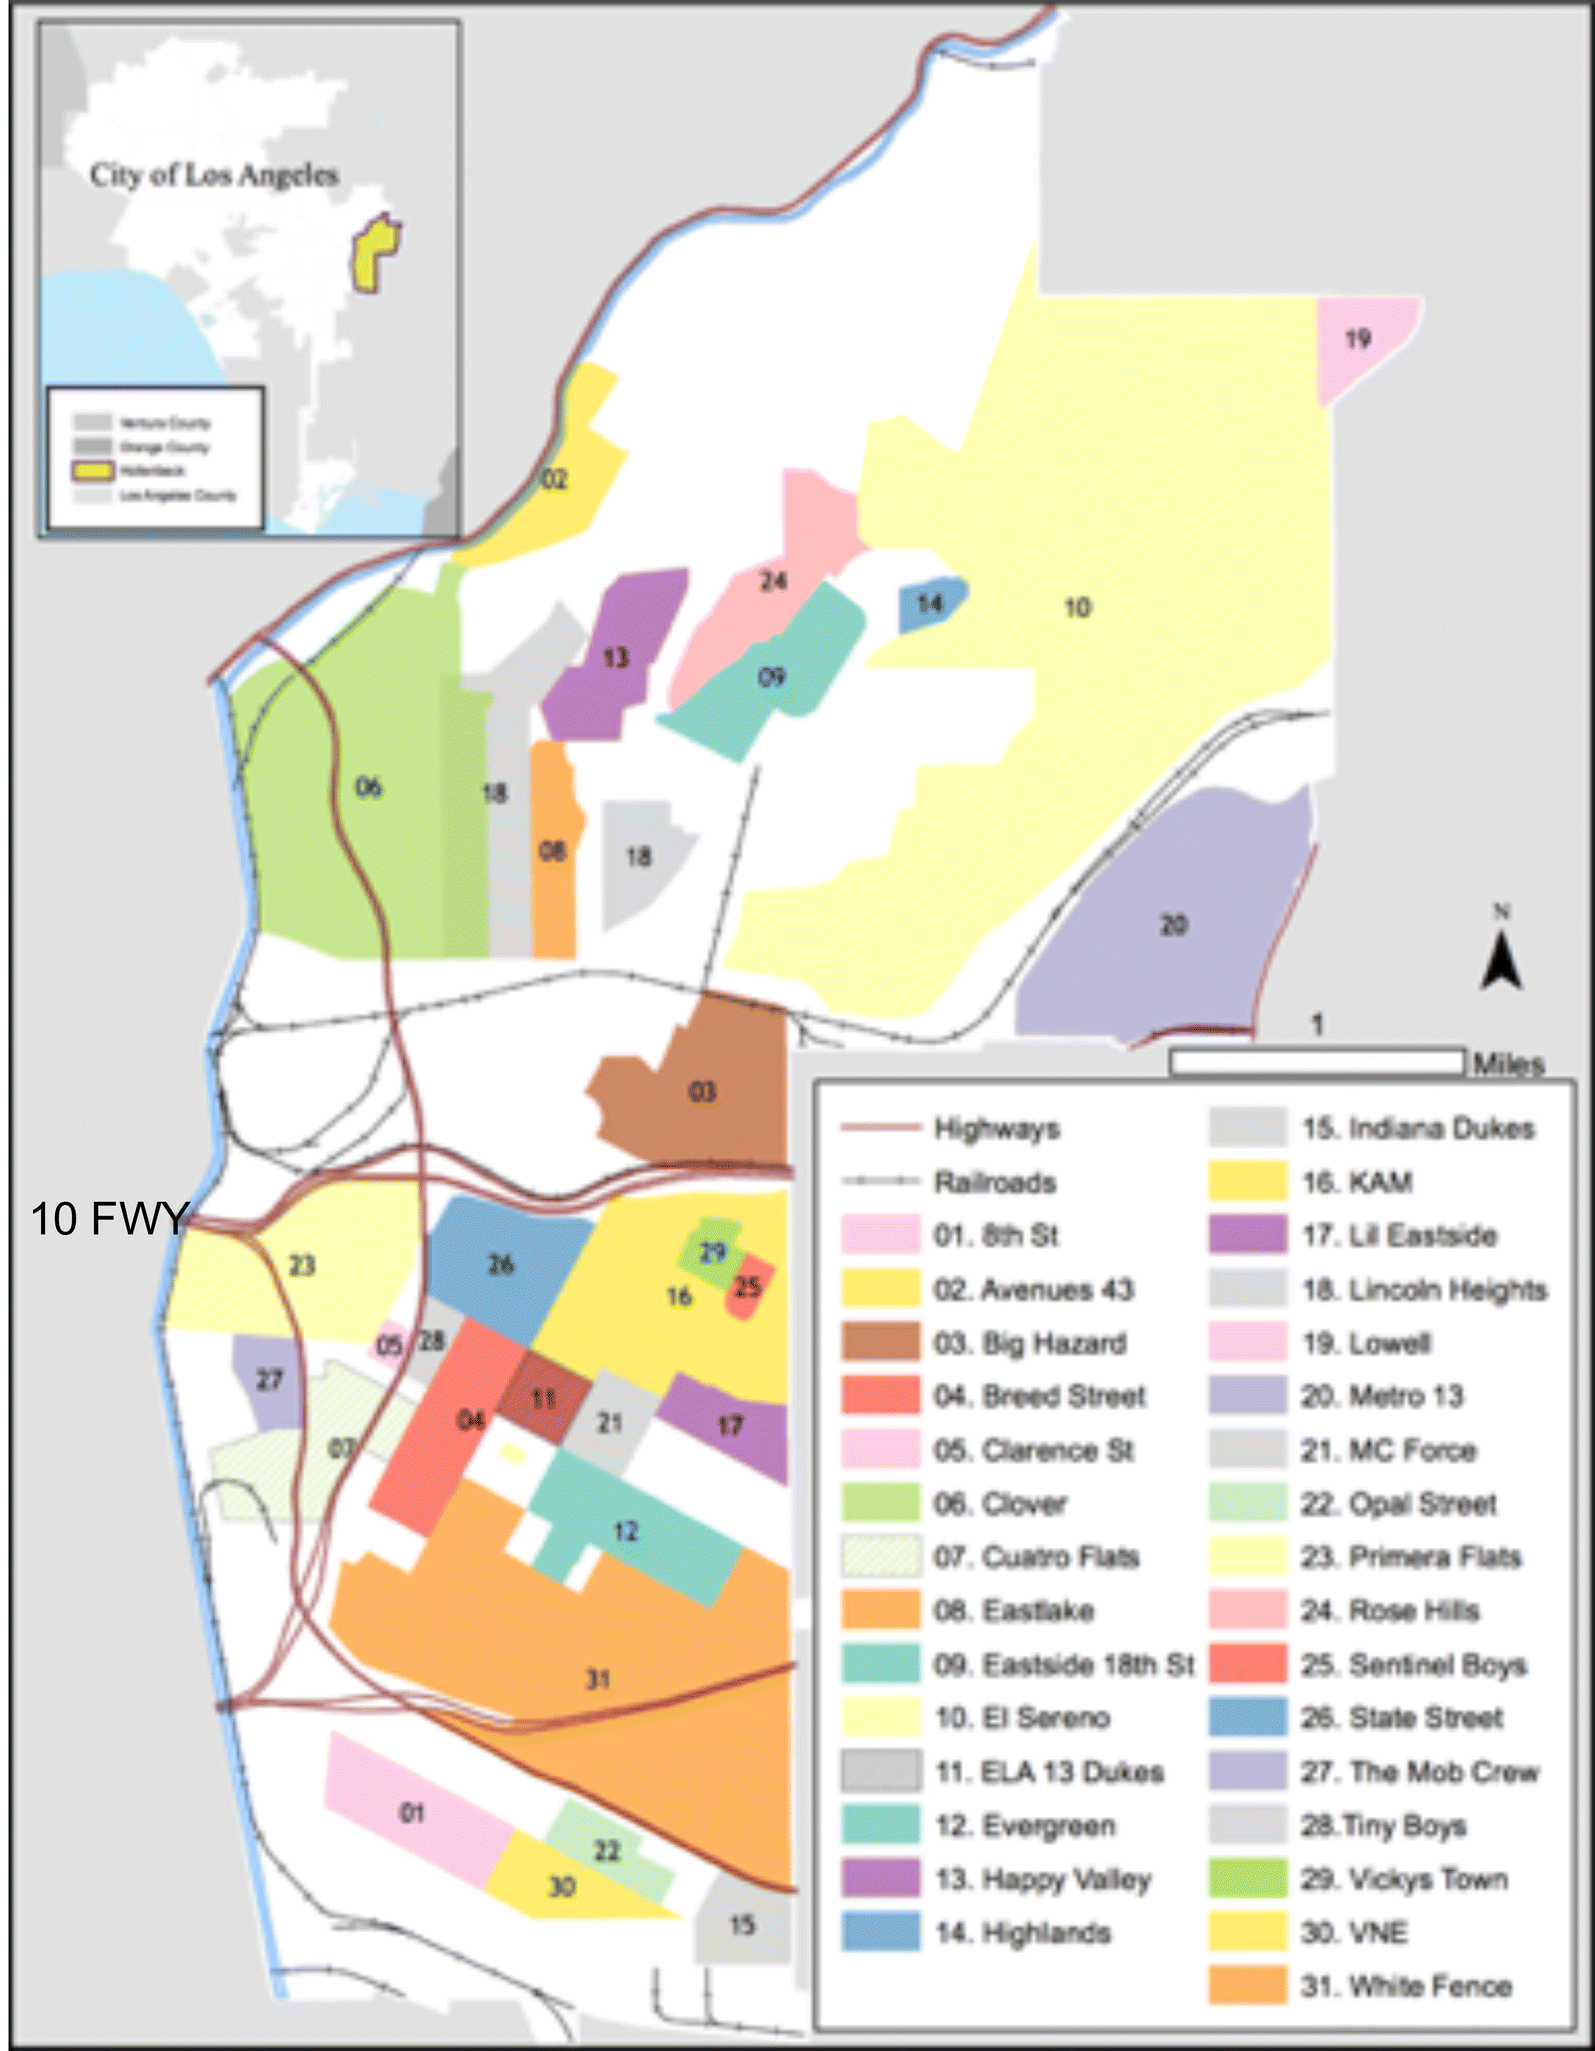 Compeive dominance, gang size and the directionality of ... on orange county gang map, spokane gang map, la county gang map, detroit gang map, gta 5 gang map, compton gang map, tampa gang map, inland empire gang map, arizona gang map, pomona gang map, pittsburgh gang map, fullerton gang map, sacramento gang map, inglewood gang map, south central gang map, long beach gangs map, new york gang map, la street gangs map, watts gang map, california gang map,